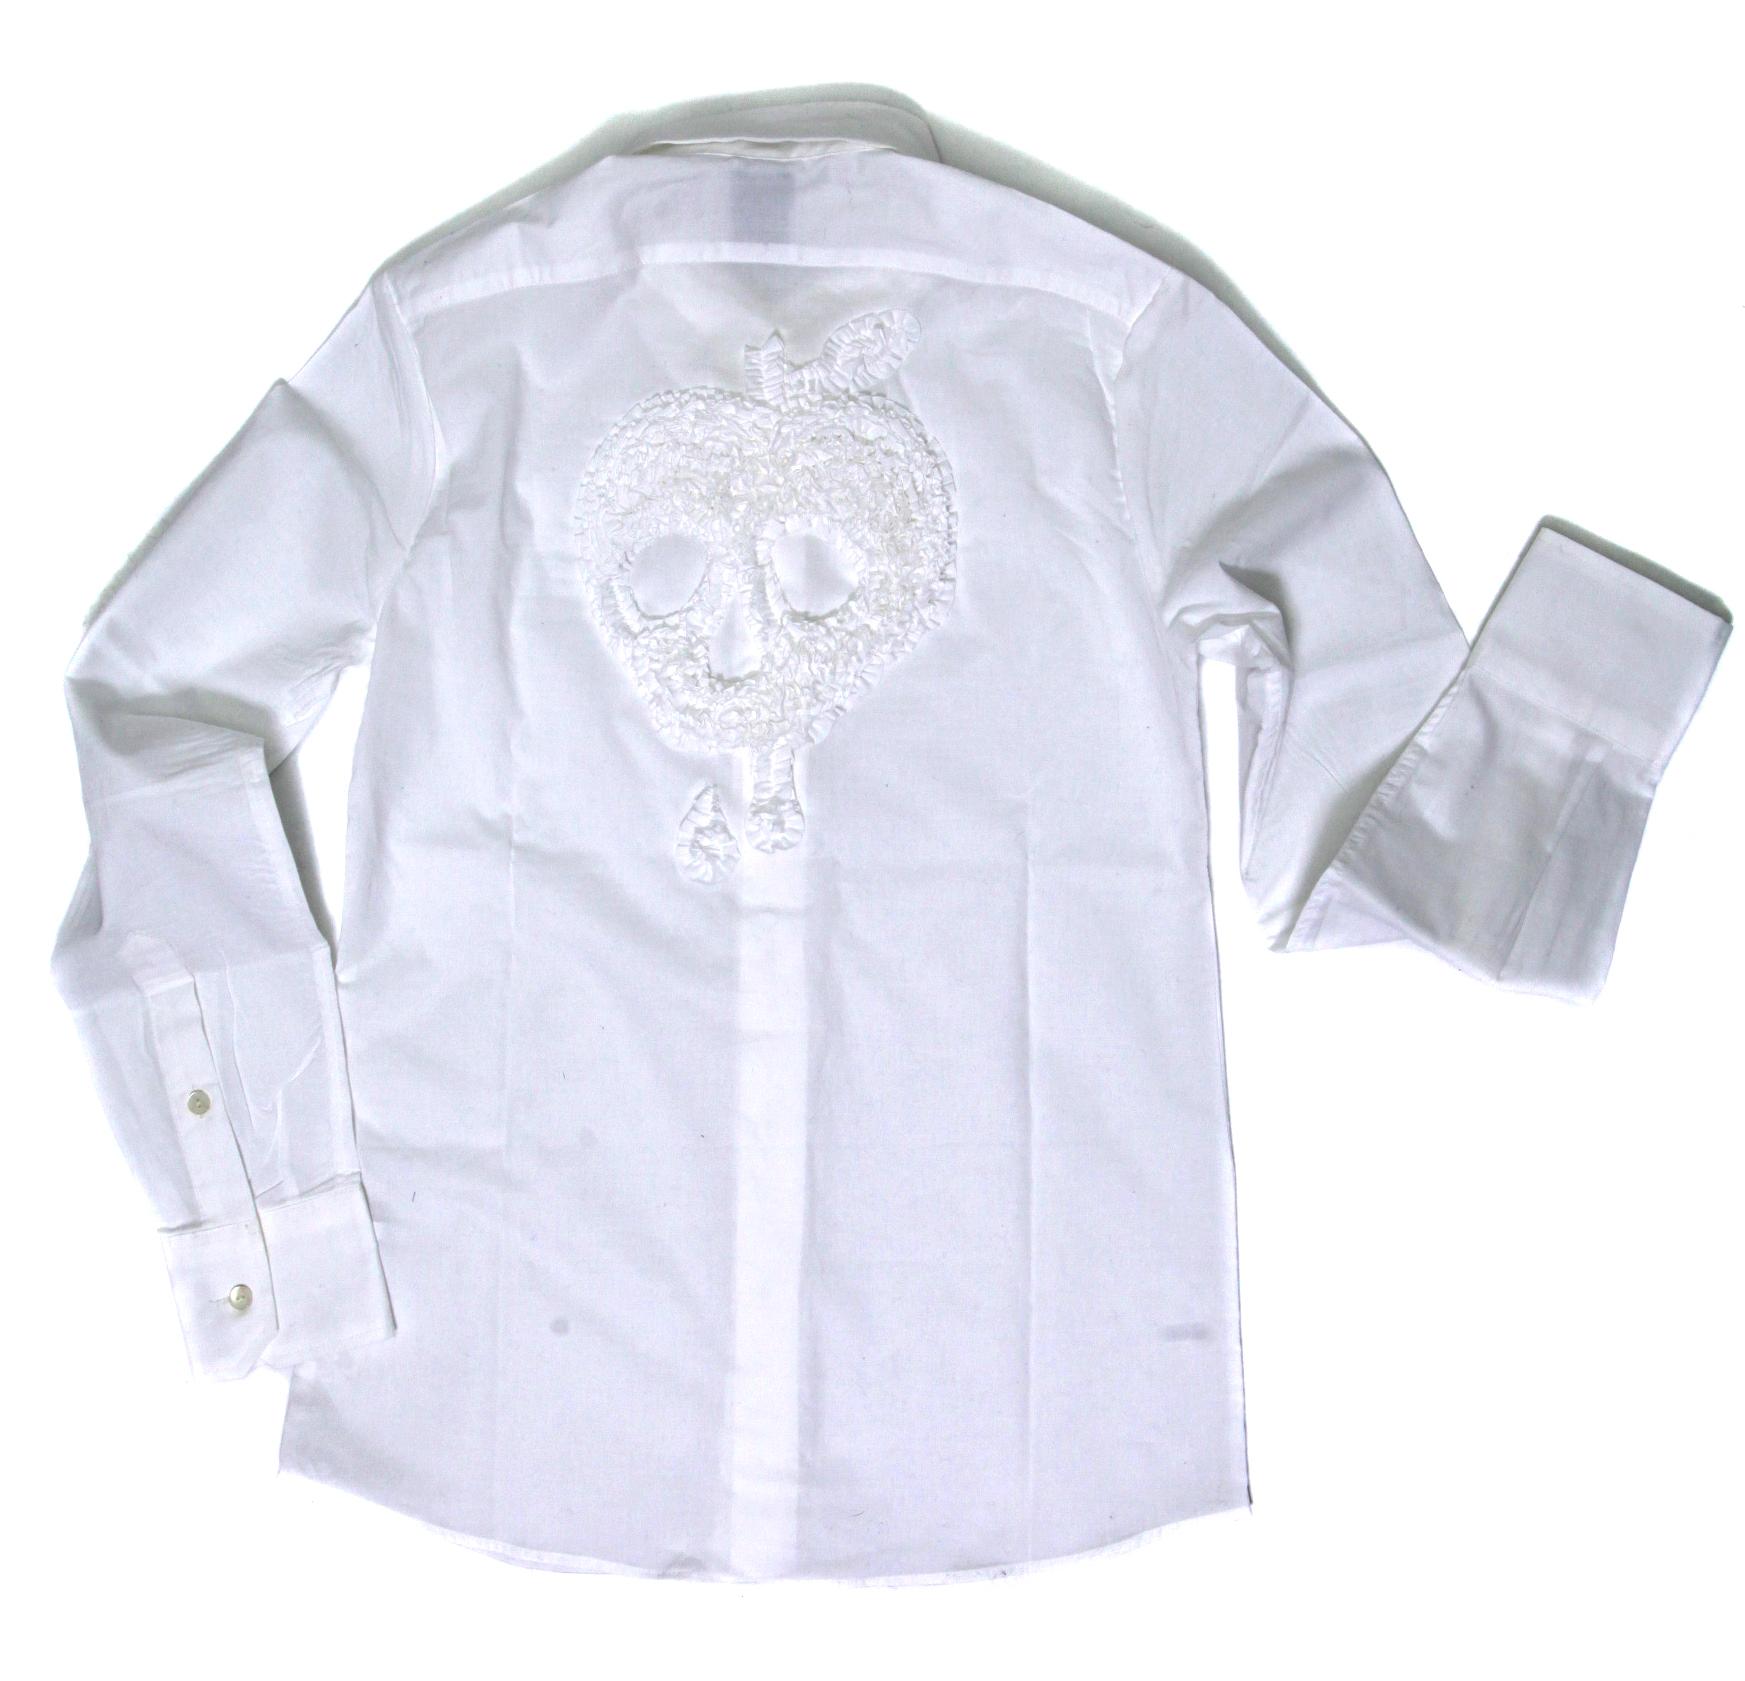 MAXSIX apple skull shirts2